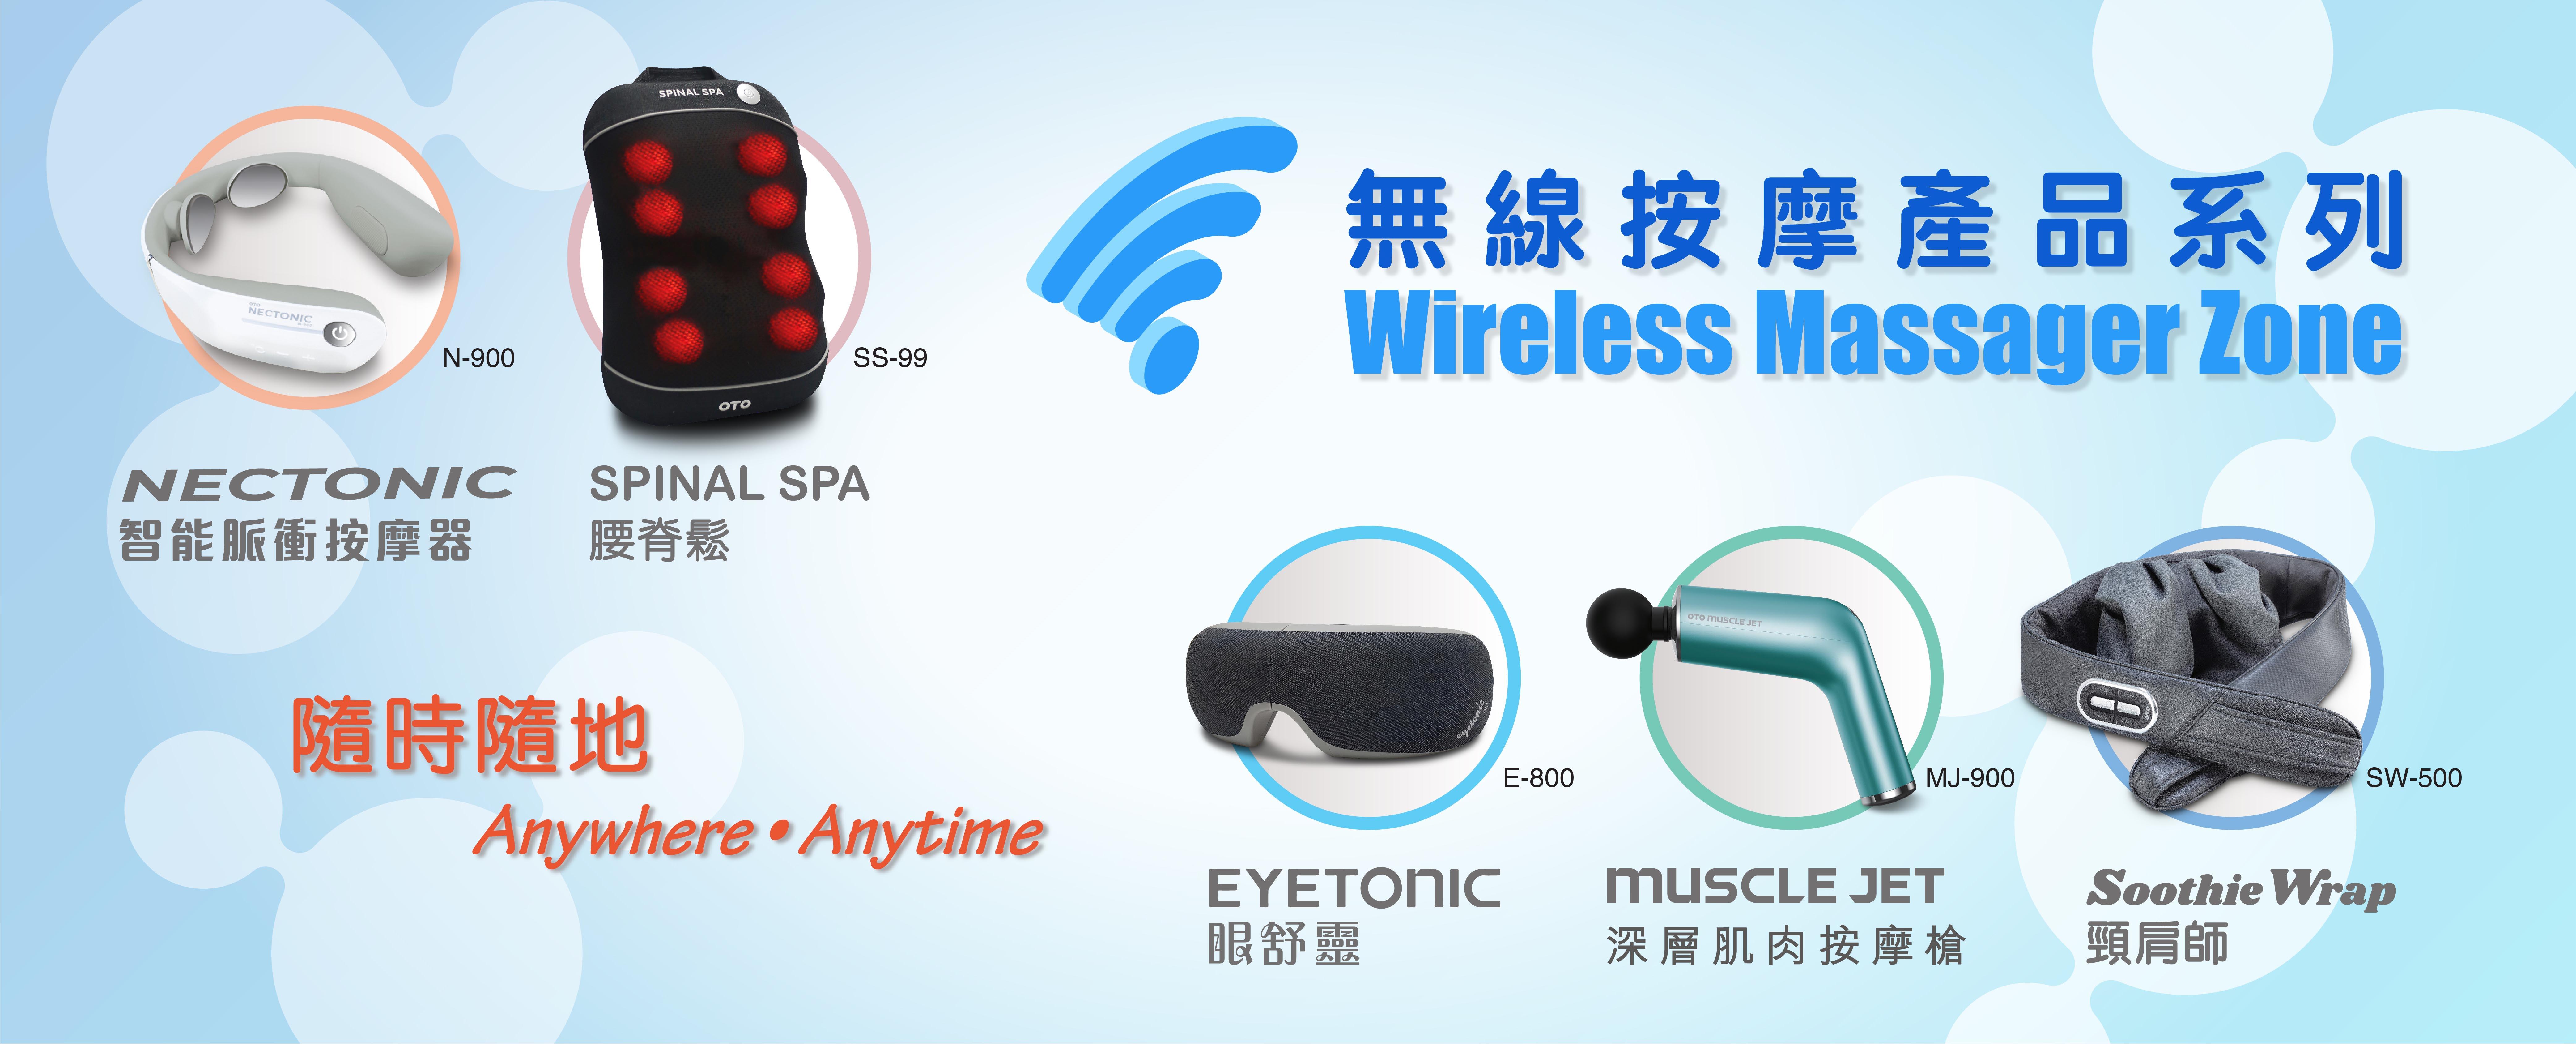 OTO 無線按摩產品系列